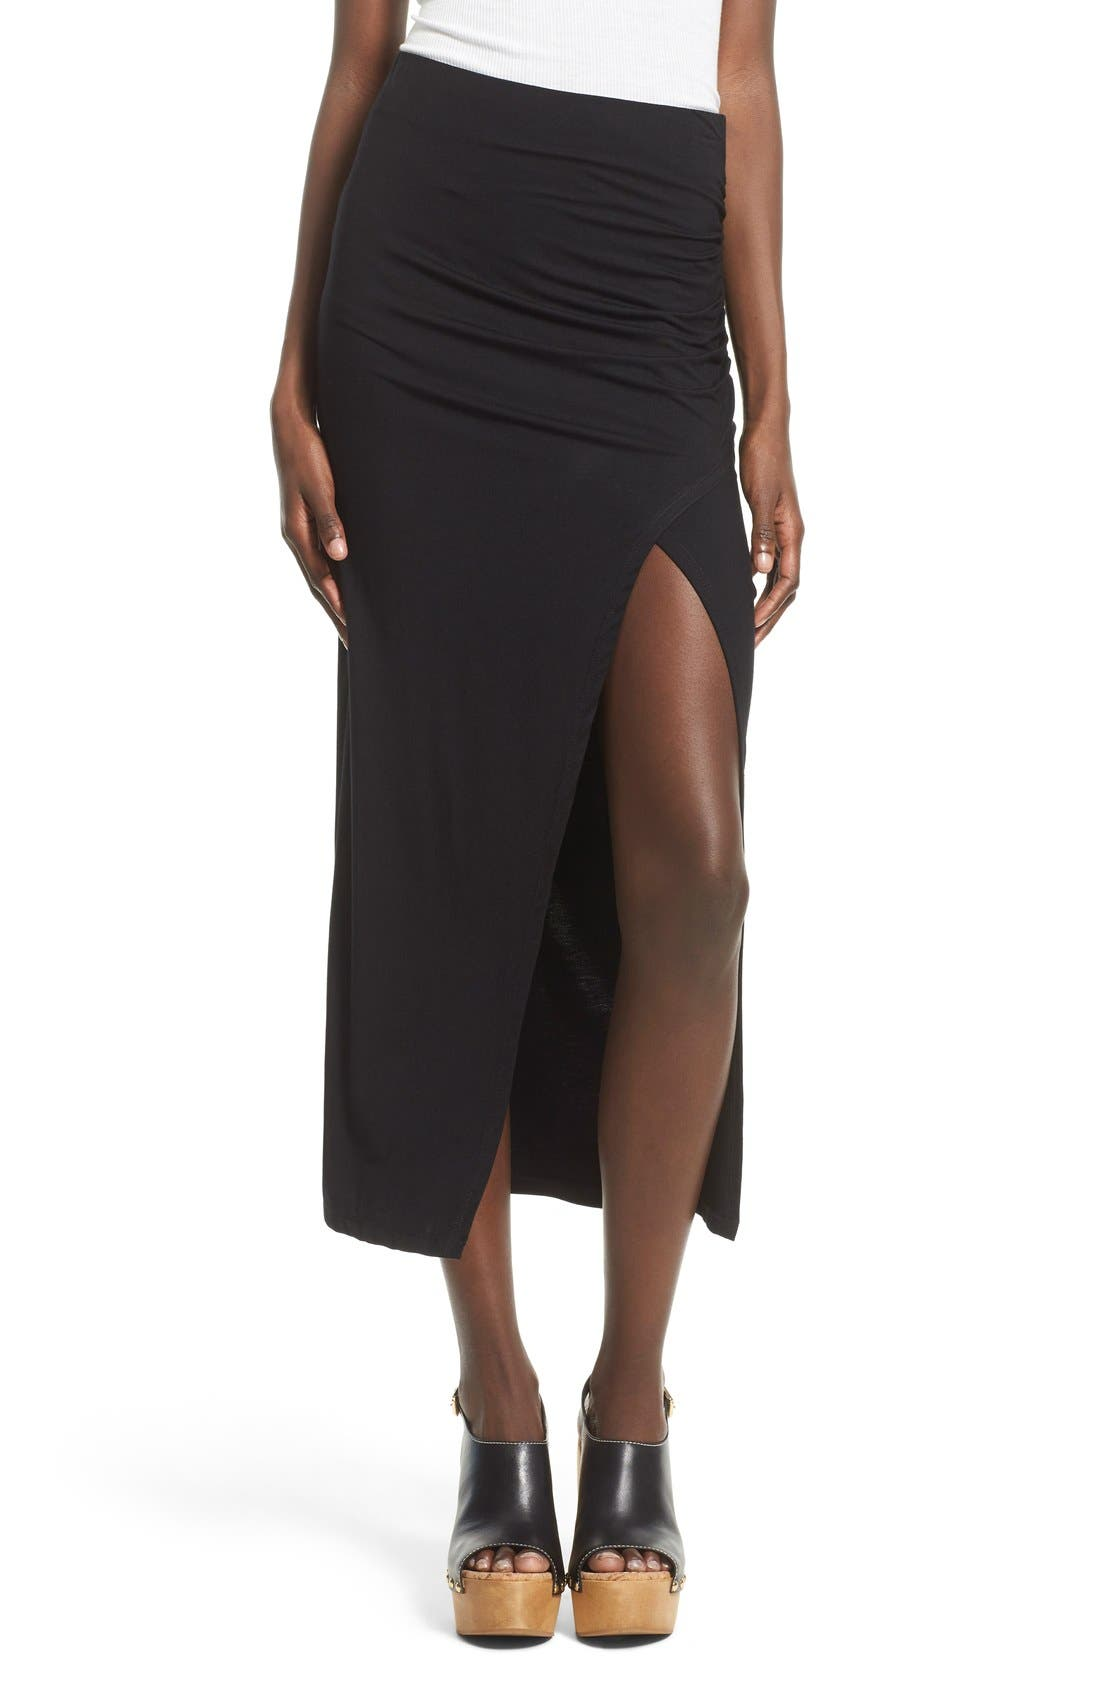 ASTR THE LABEL, ASTR High Slit Maxi Skirt, Main thumbnail 1, color, 001